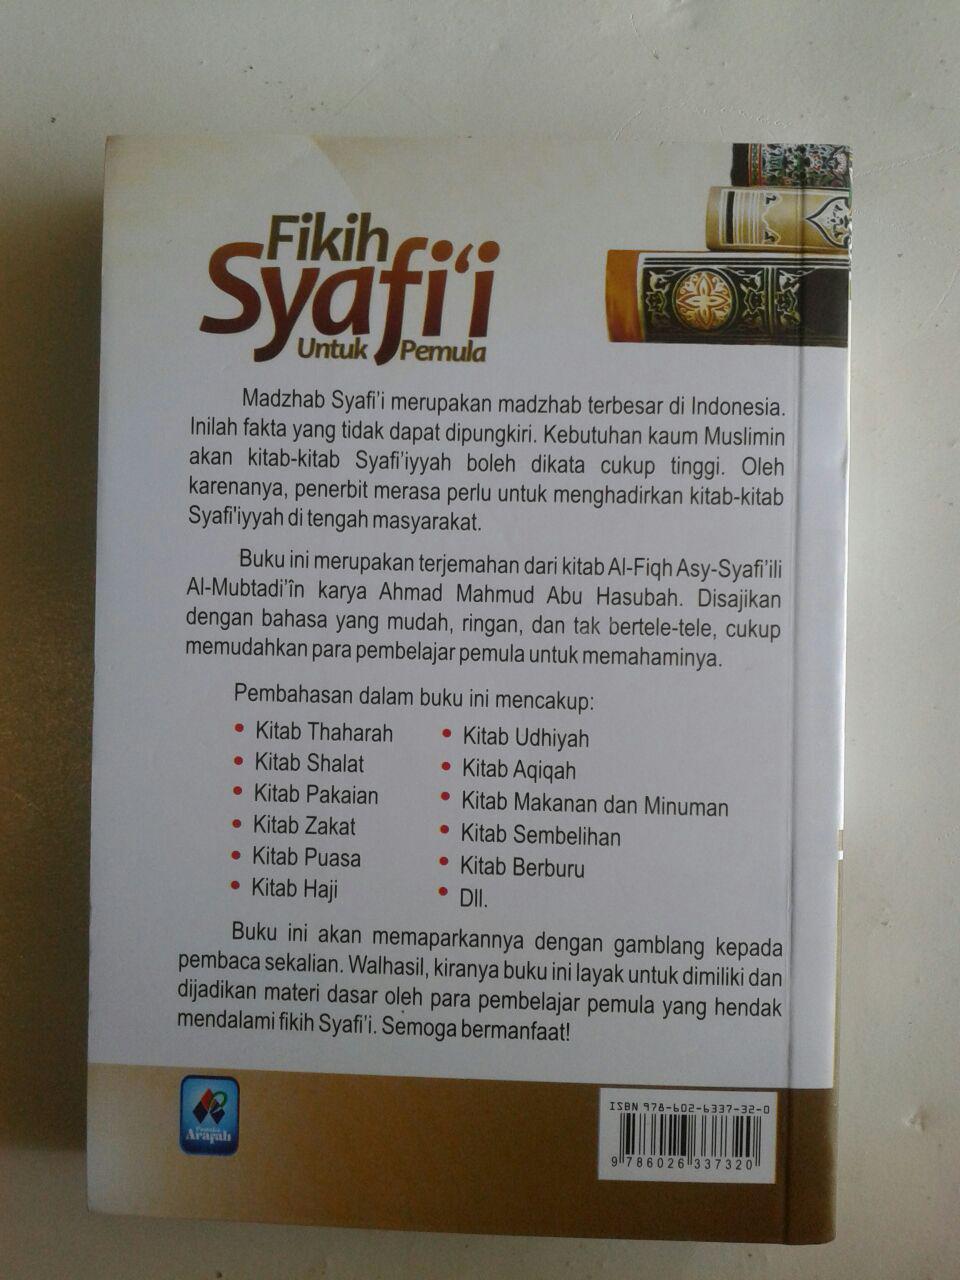 Buku Fikih Syafi'I Untuk Pemula Belajar Mudah Tingkat Dasar cover